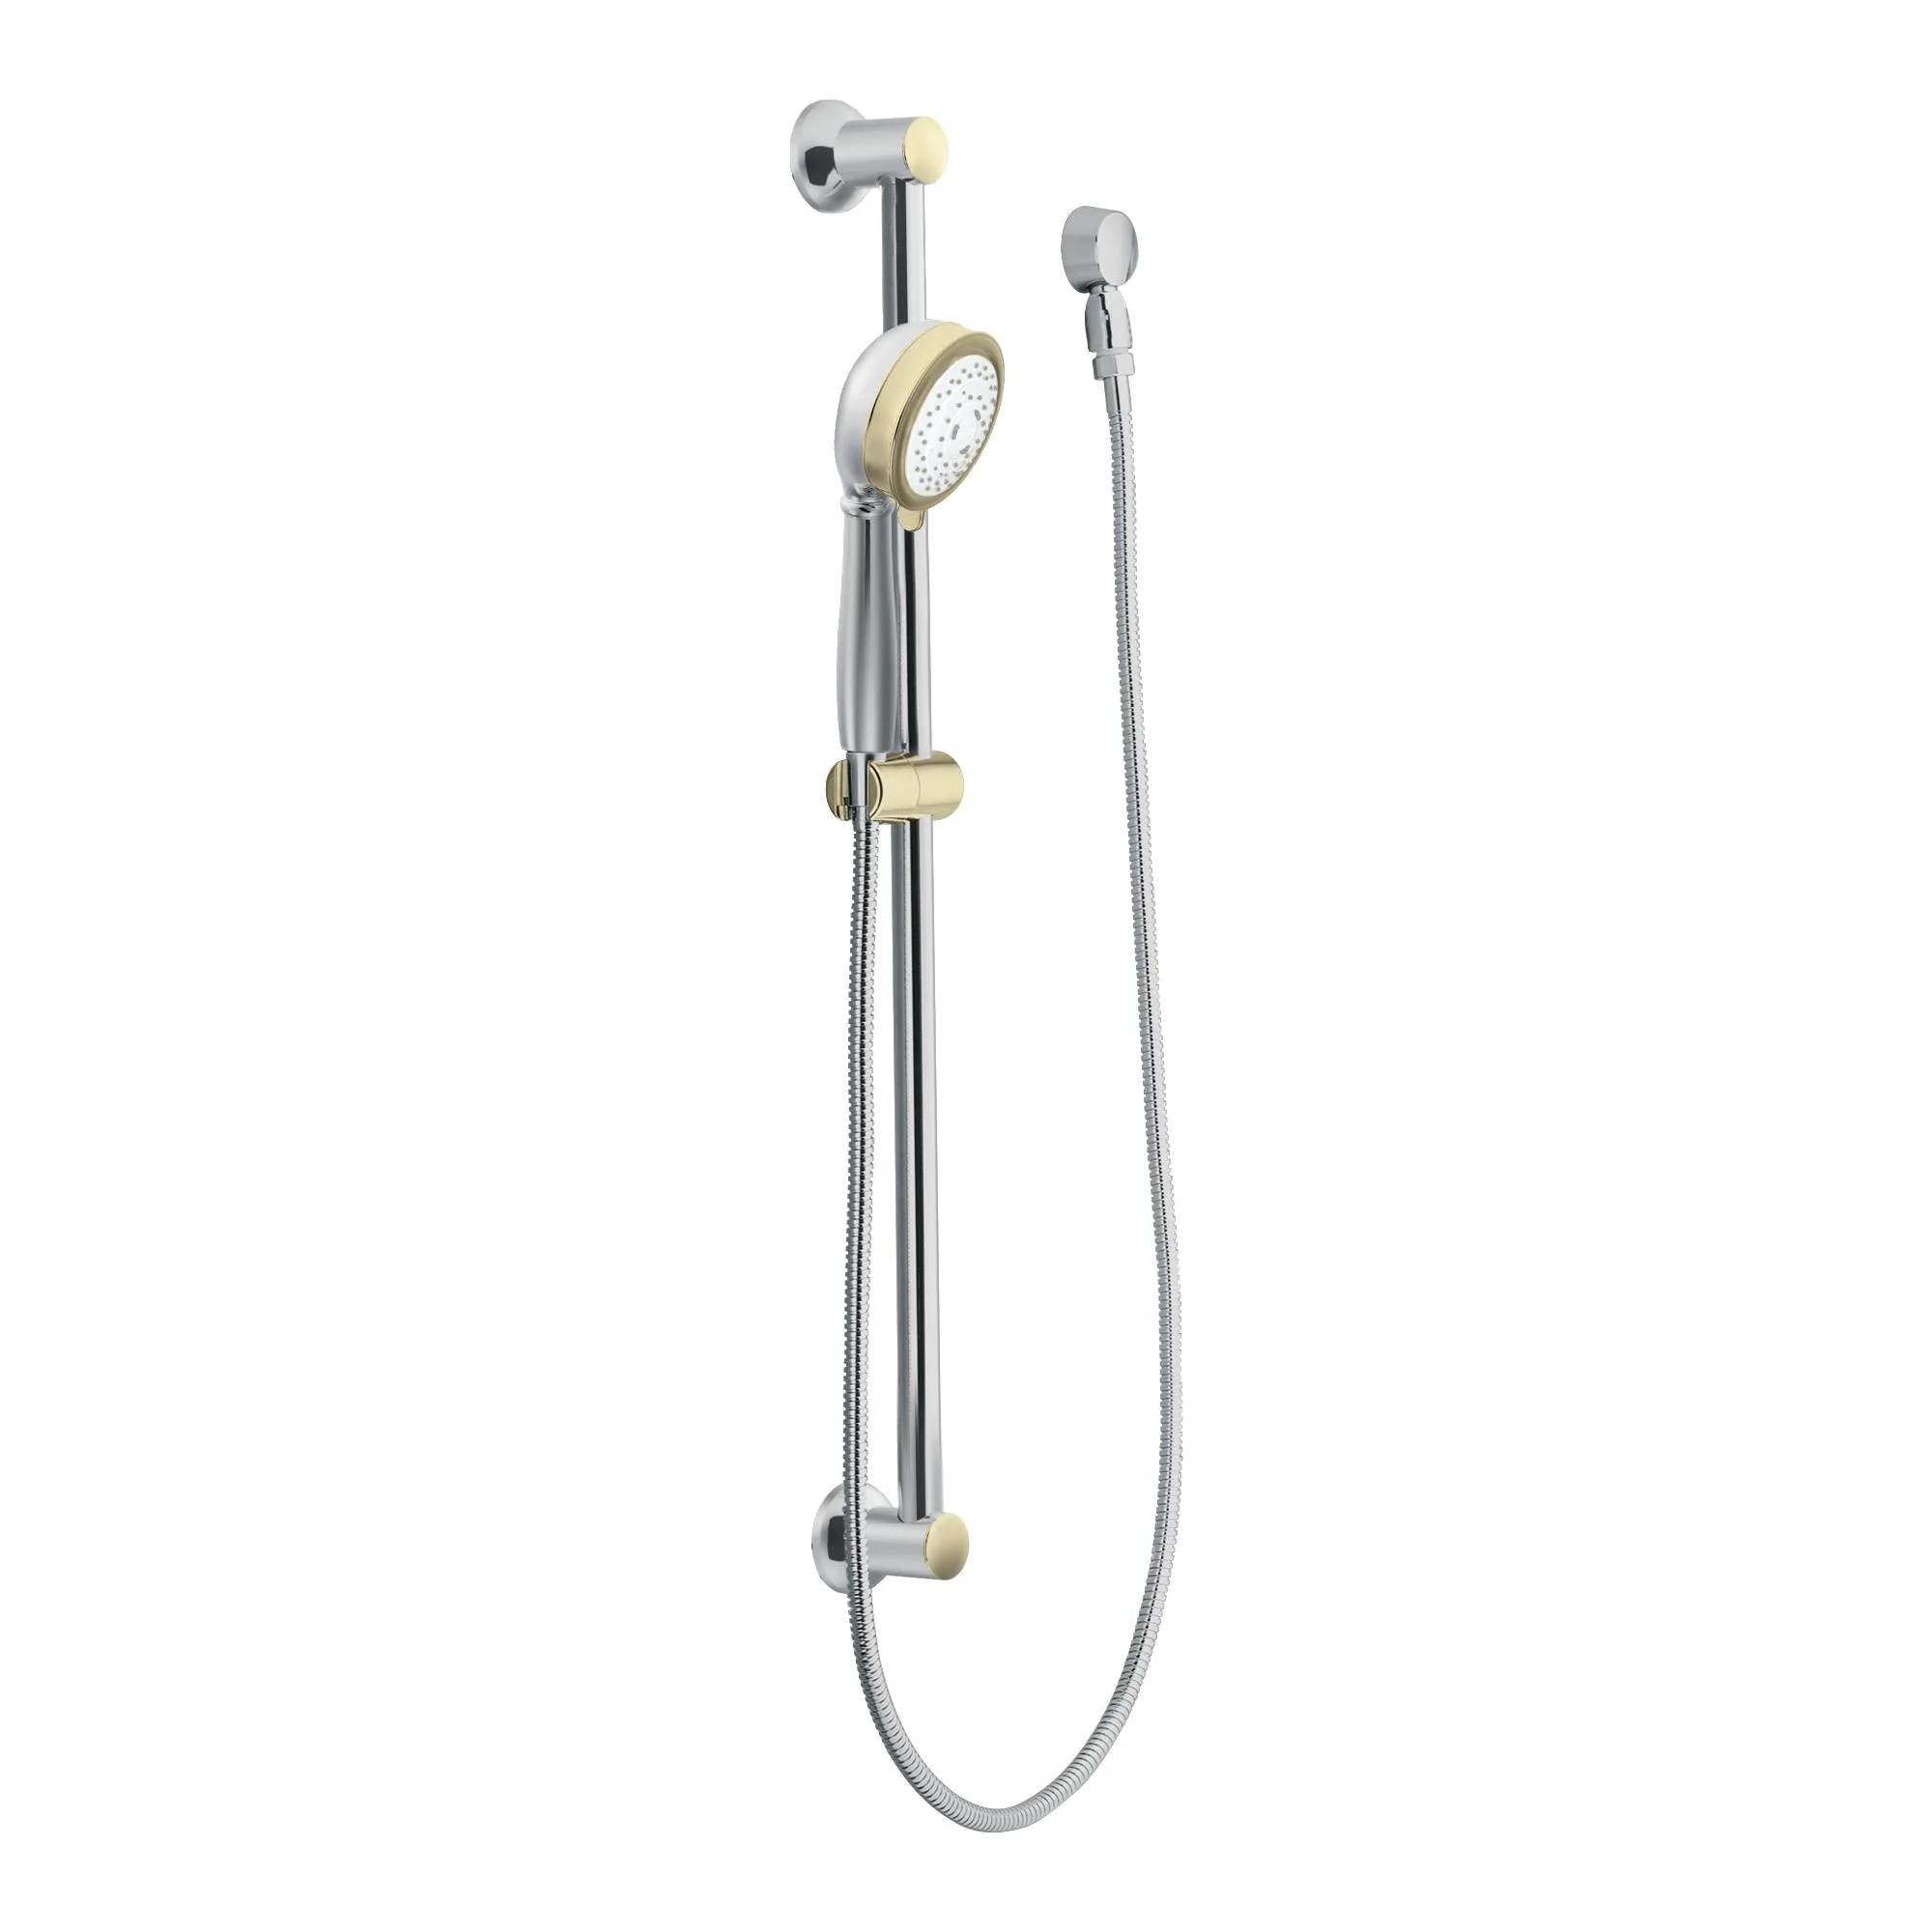 Moen 3867cp Chrome Polished Brass Multi Function Hand Shower